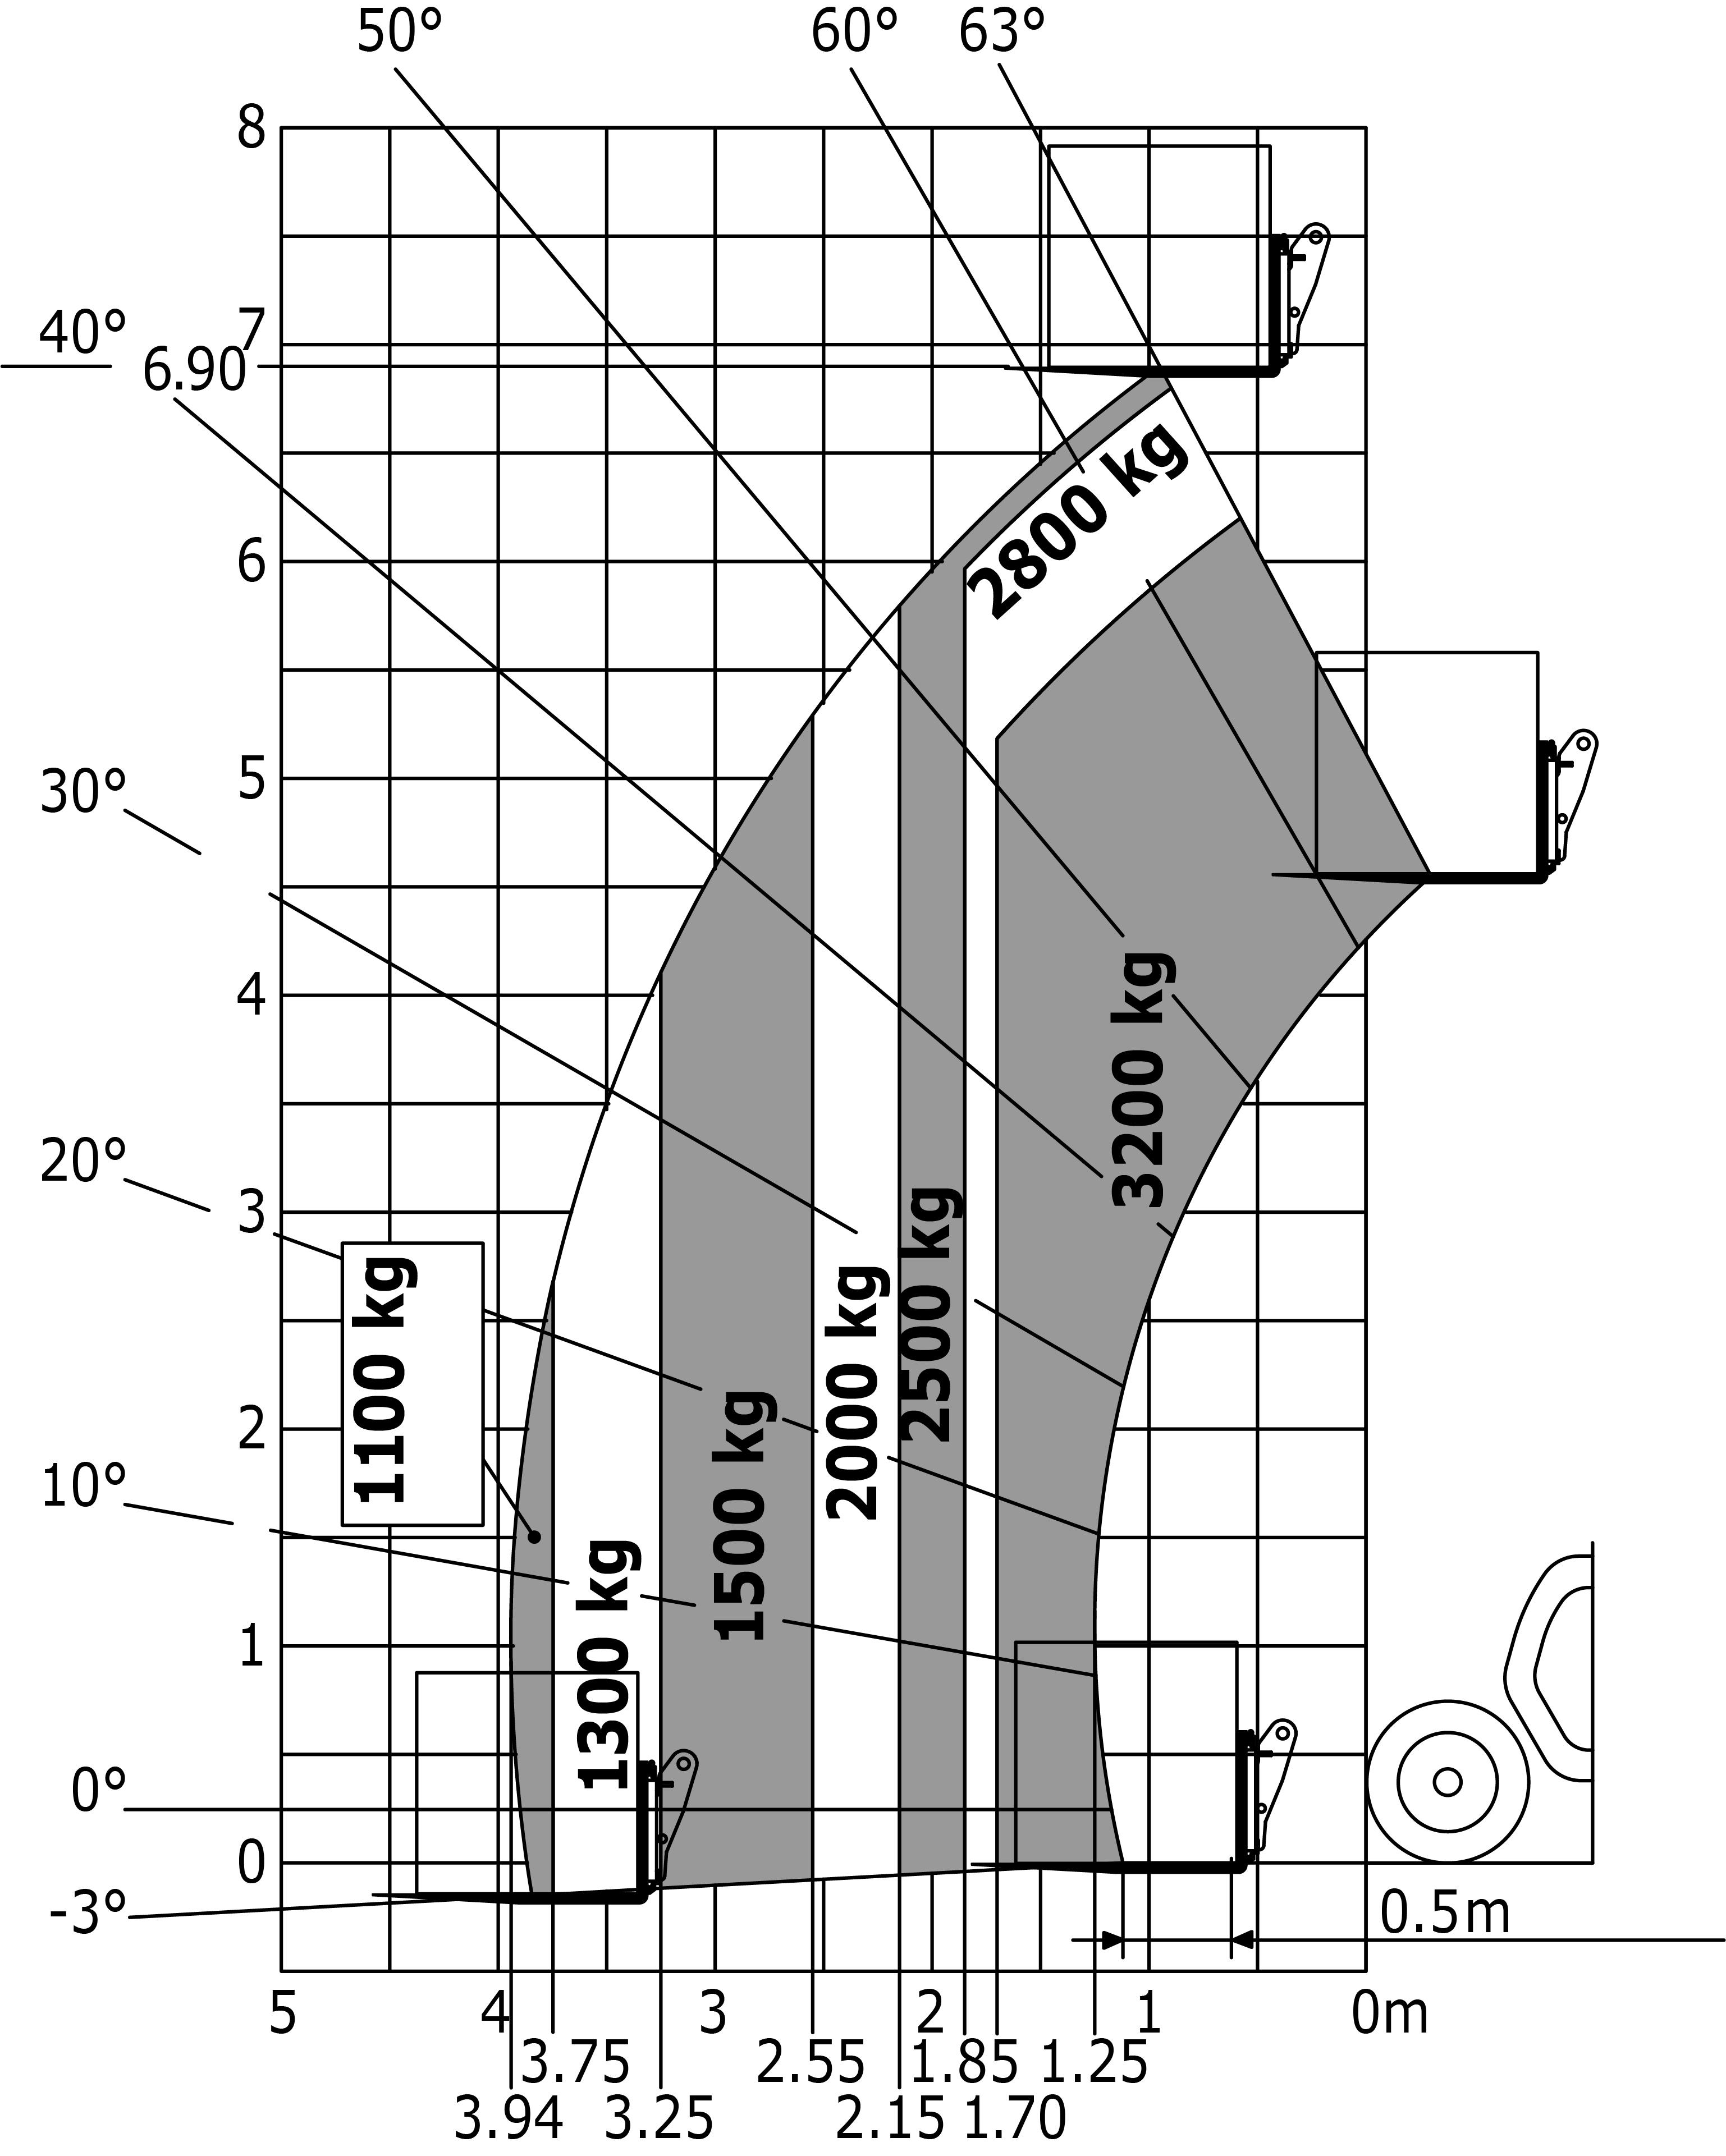 manitou mt 732 easy telehandlers rh manitou com manitou forklift wiring diagram manitou telehandler wiring diagram